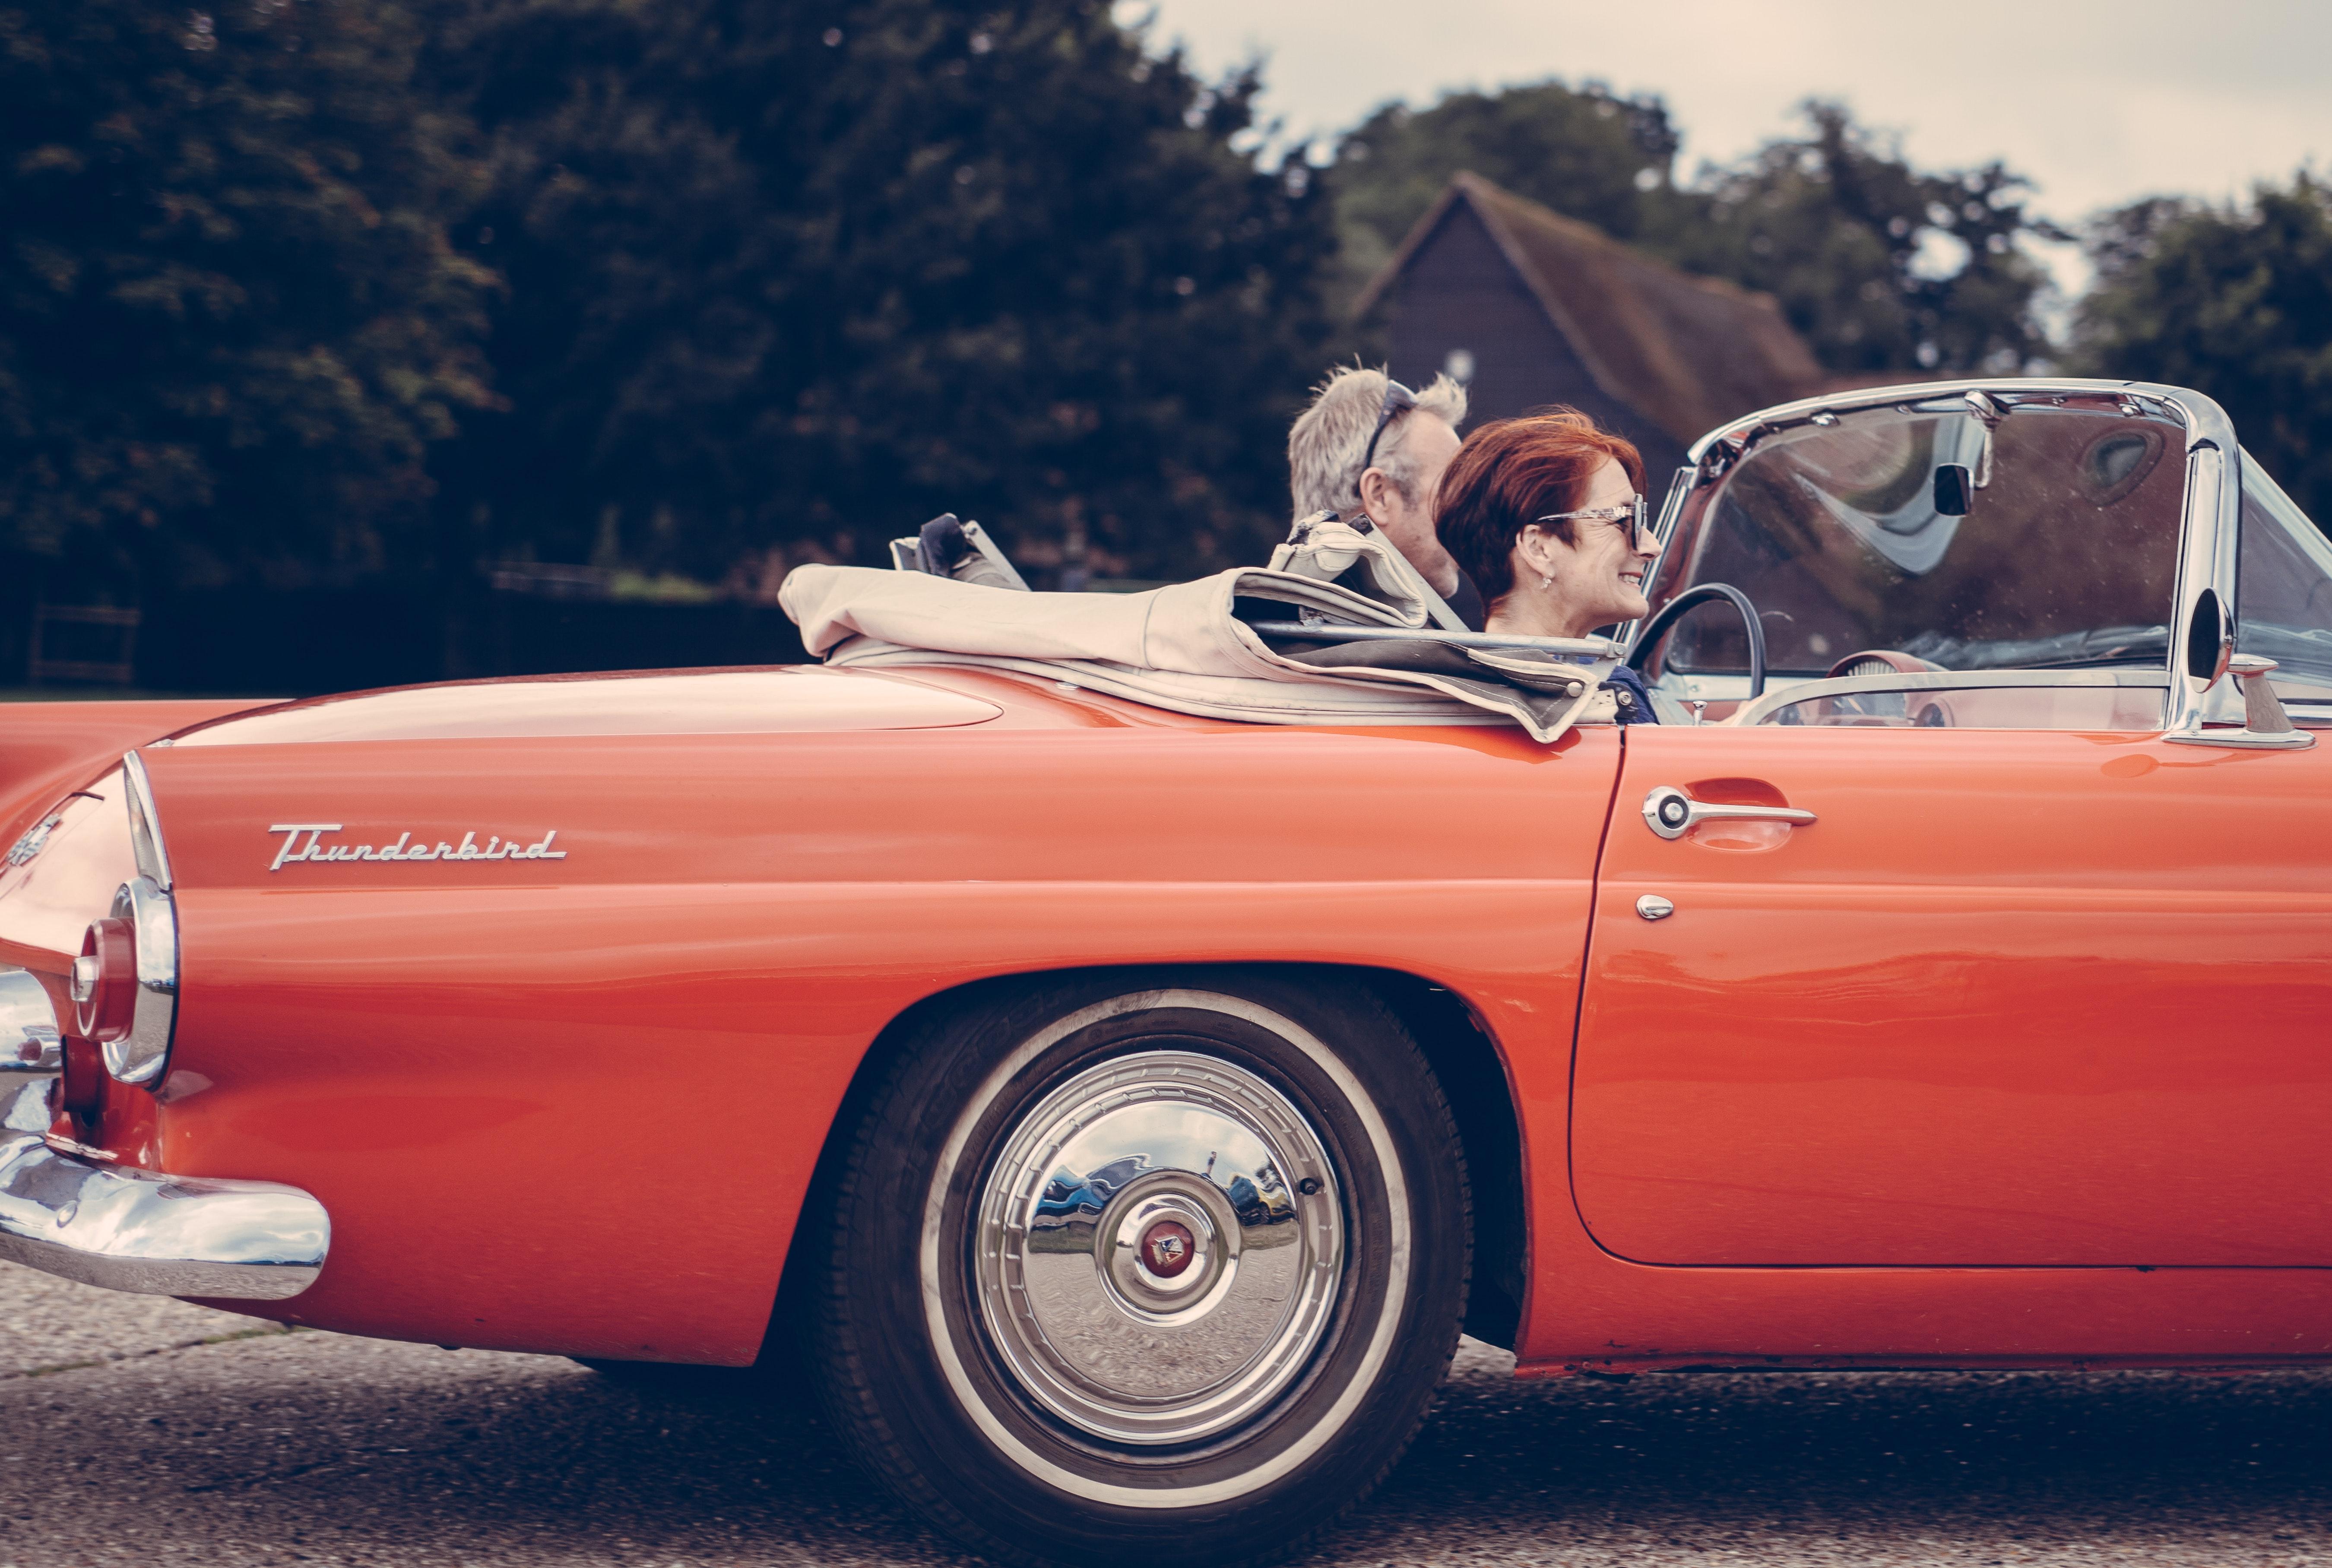 Couple Riding Red Ford Thunderbird during Daytime, Asphalt, Reflection, Vintage car, Vintage, HQ Photo